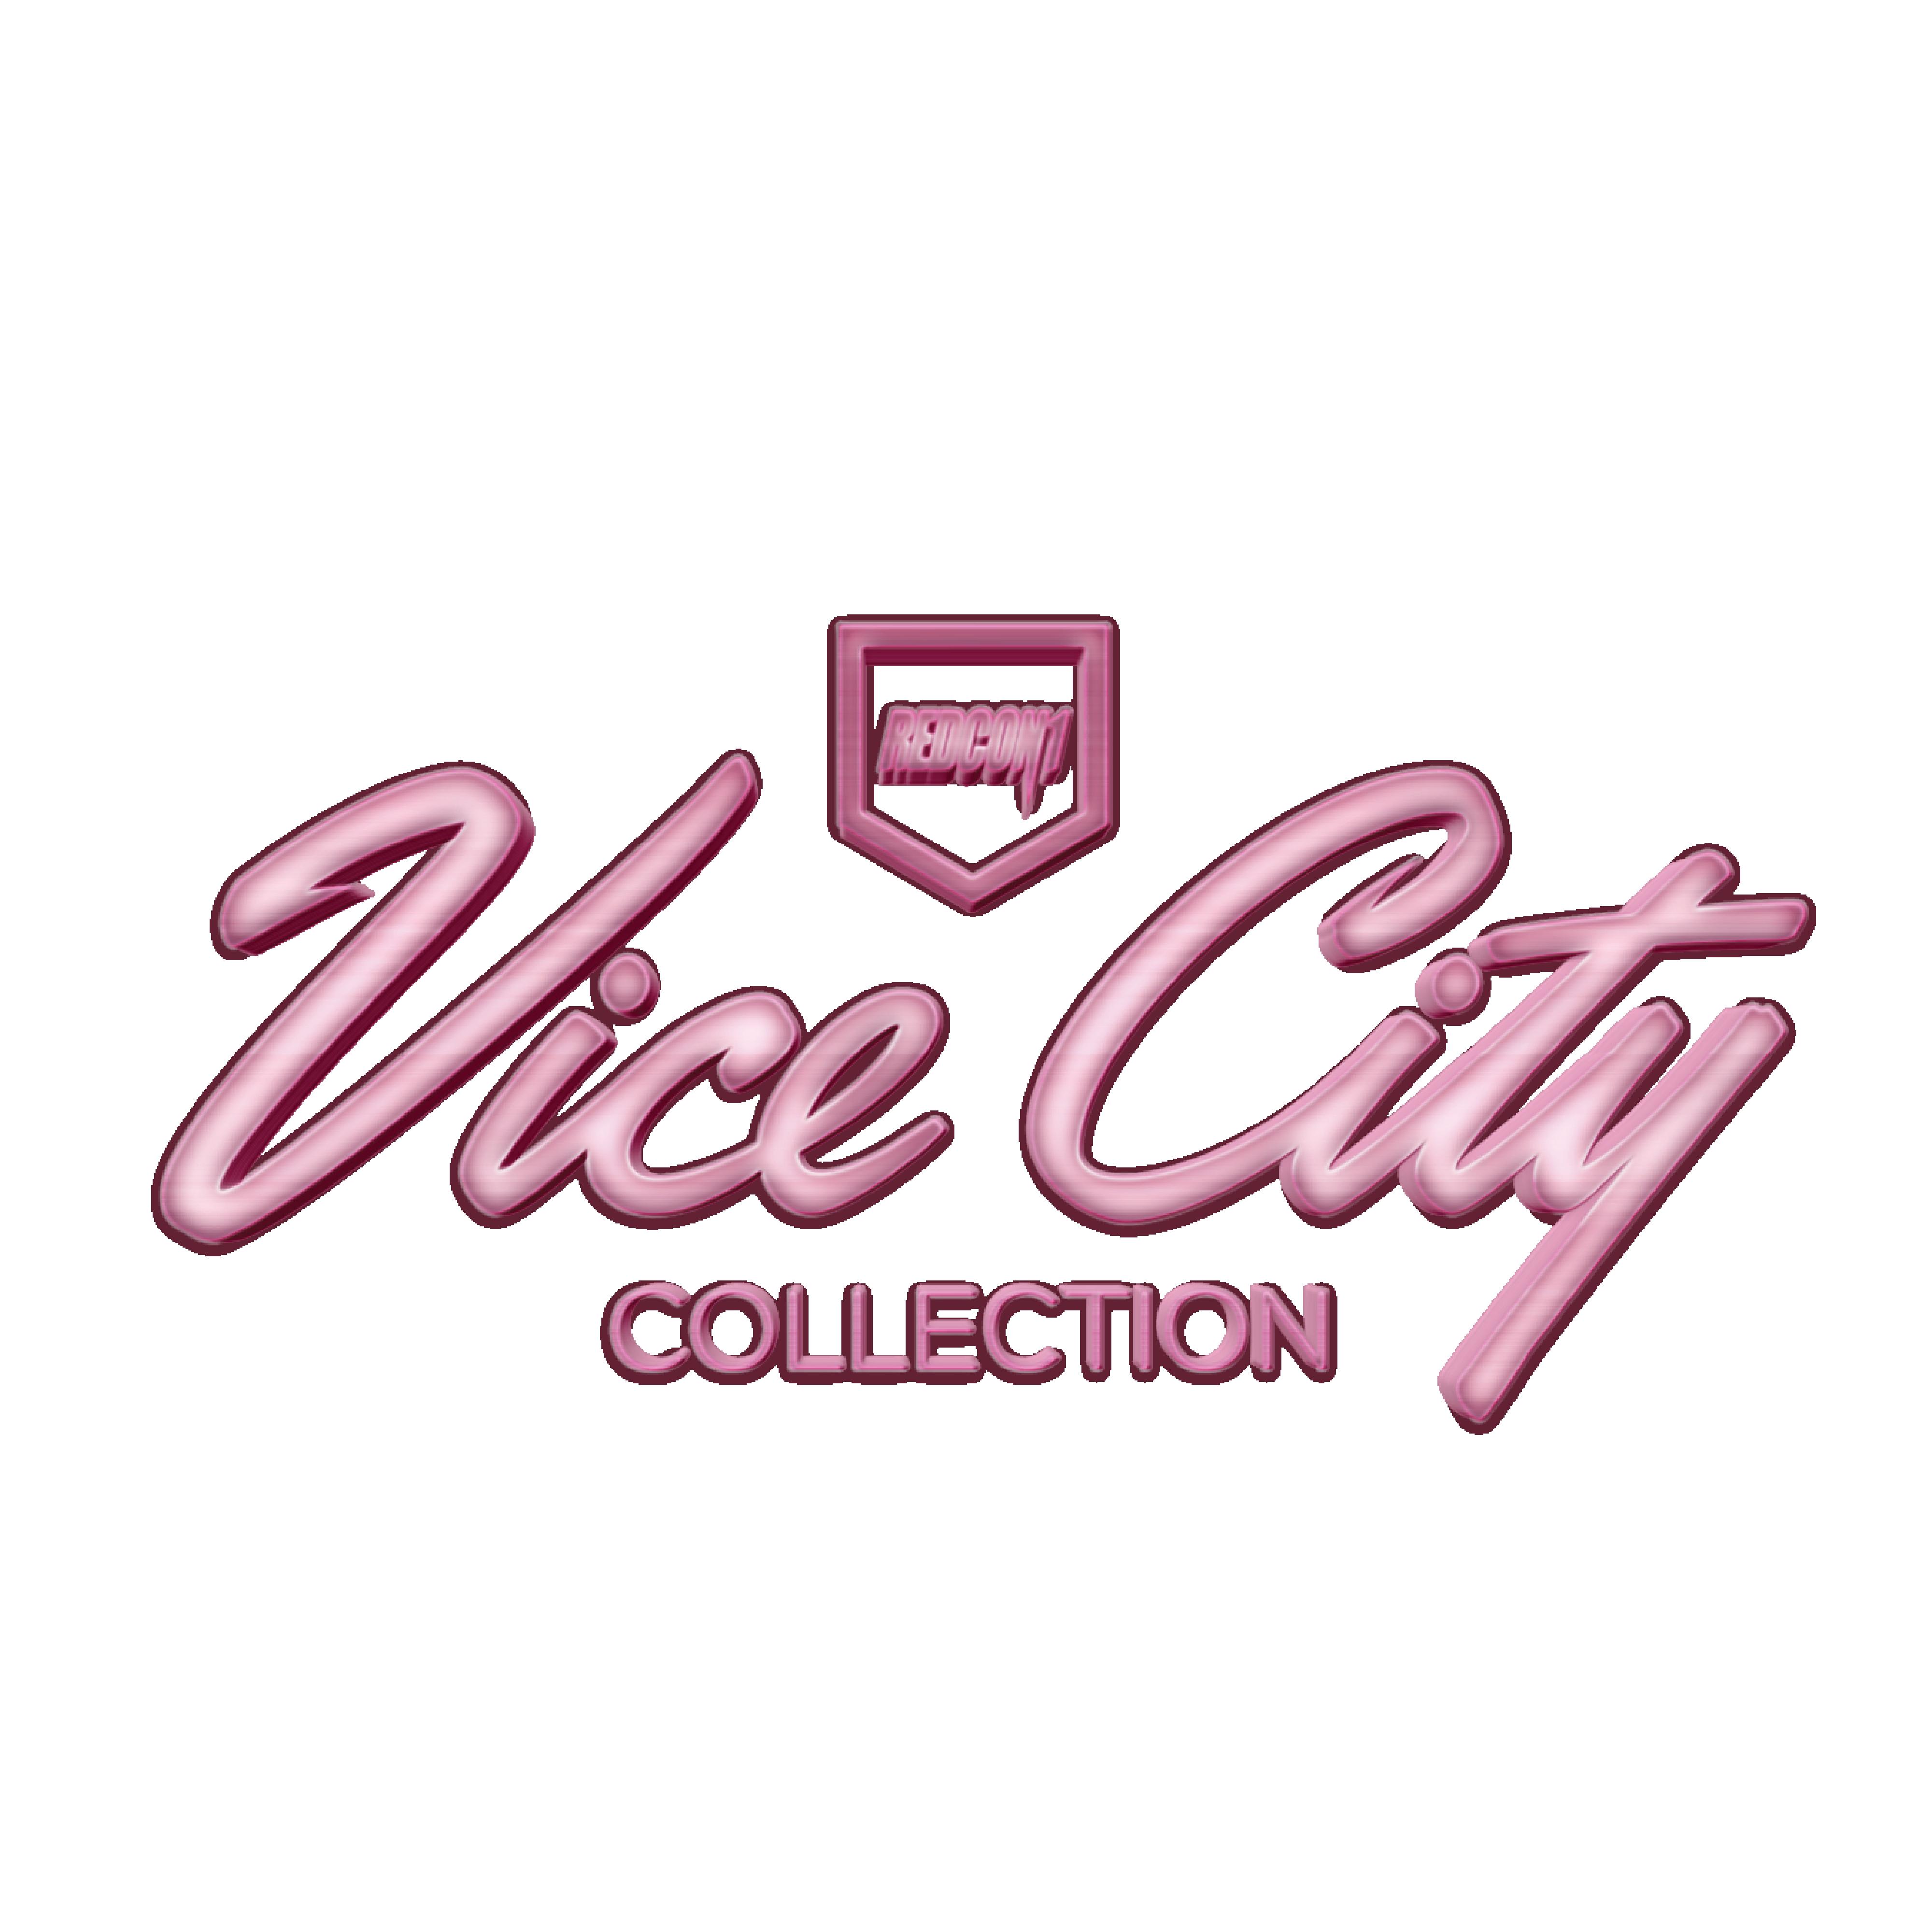 VICE_gpg1li